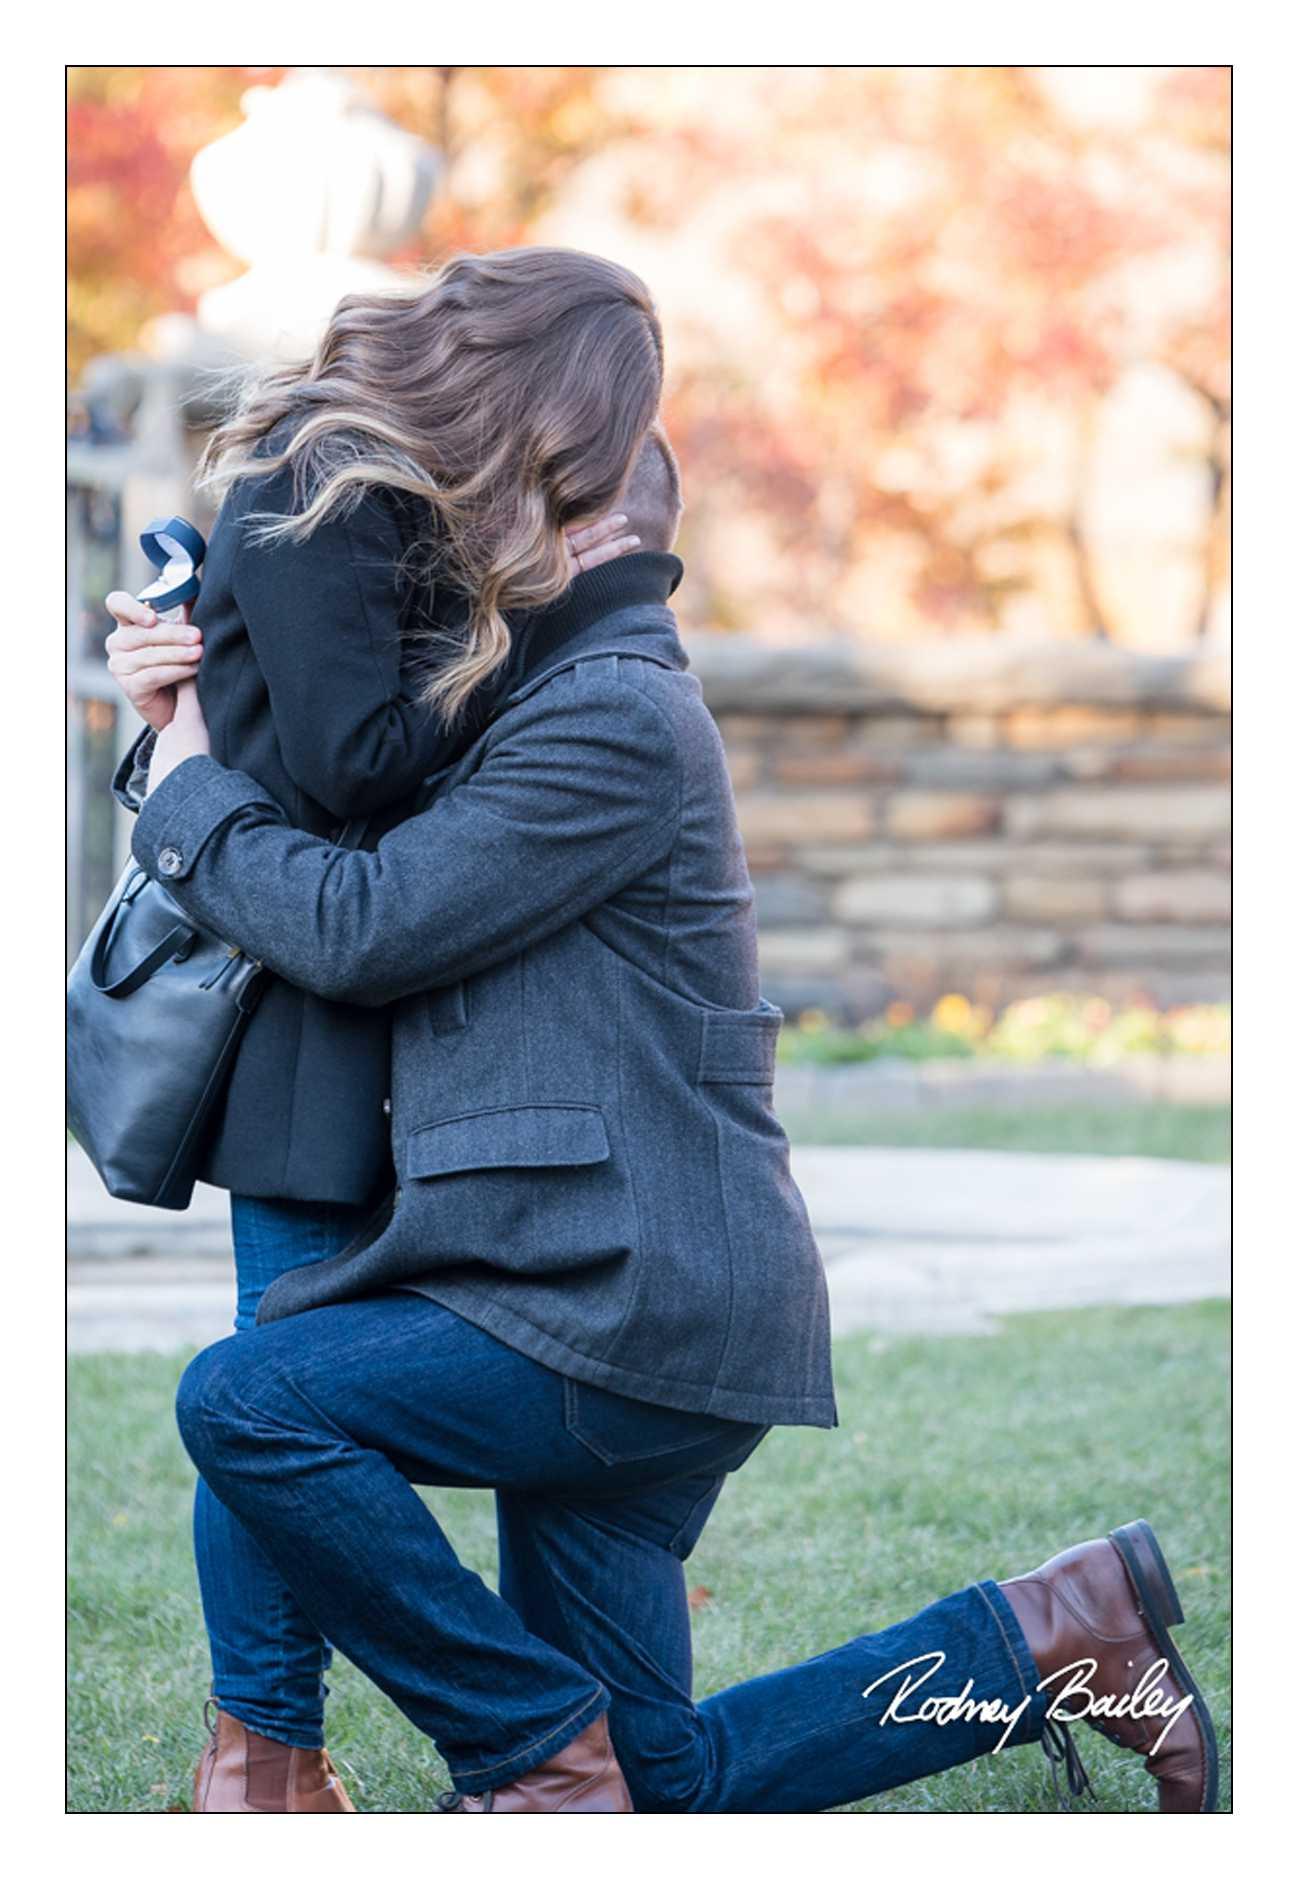 Marriage Proposal Photographer Dumbarton Oaks Rodney Bailey Photography Washington DC